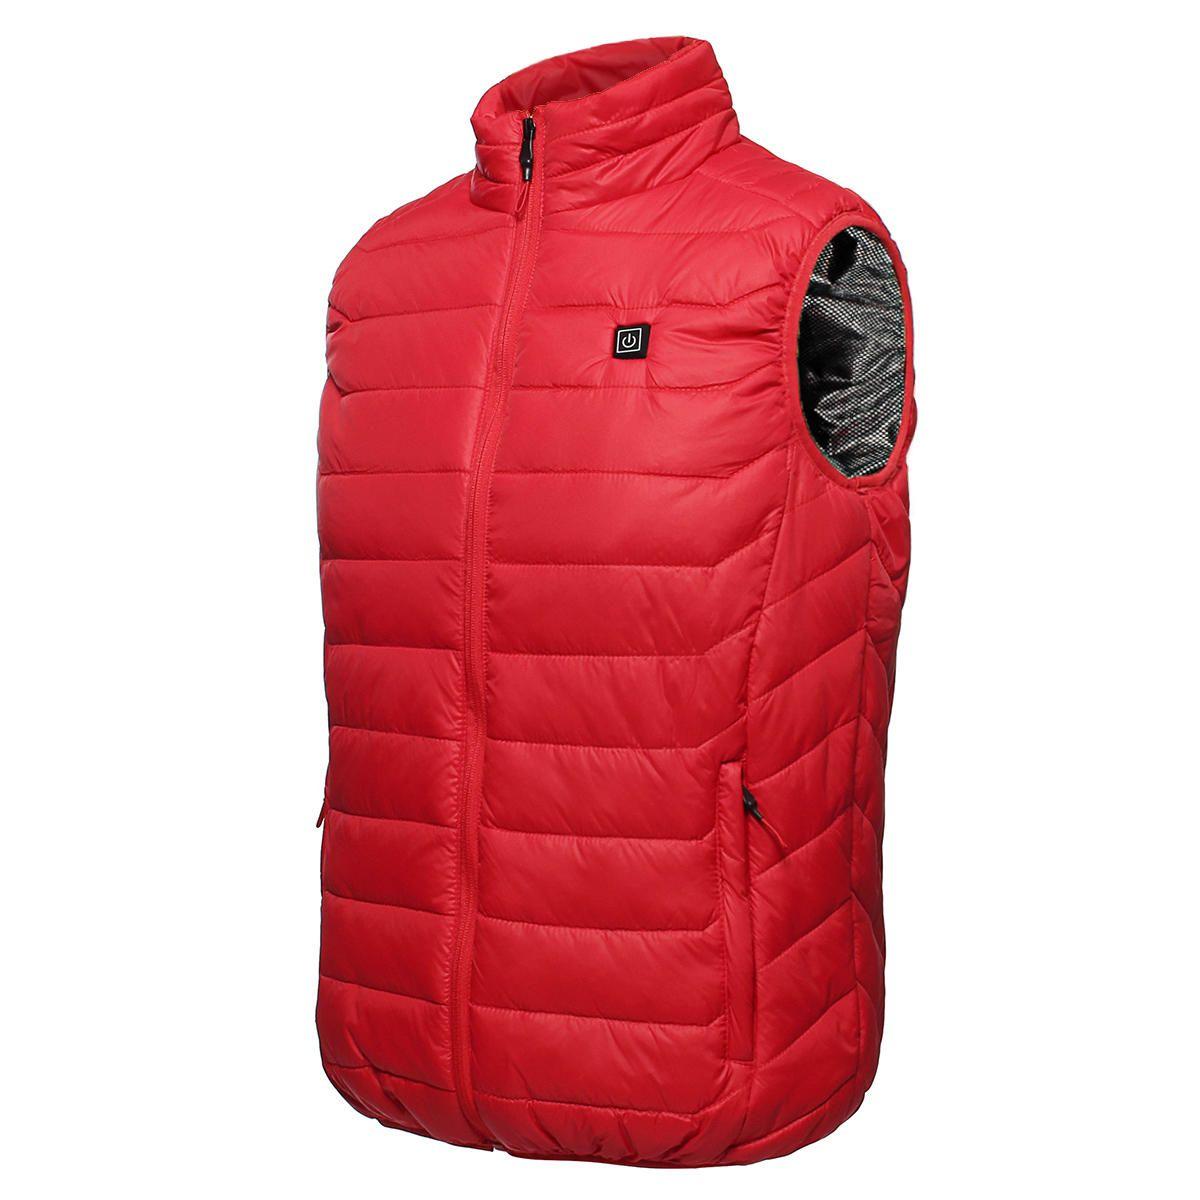 SNT US$32.42 Red Unisex USB Heating Vest Smart Winter Body Warmer Outdoor Racing Jacket Heater Xmas Gift